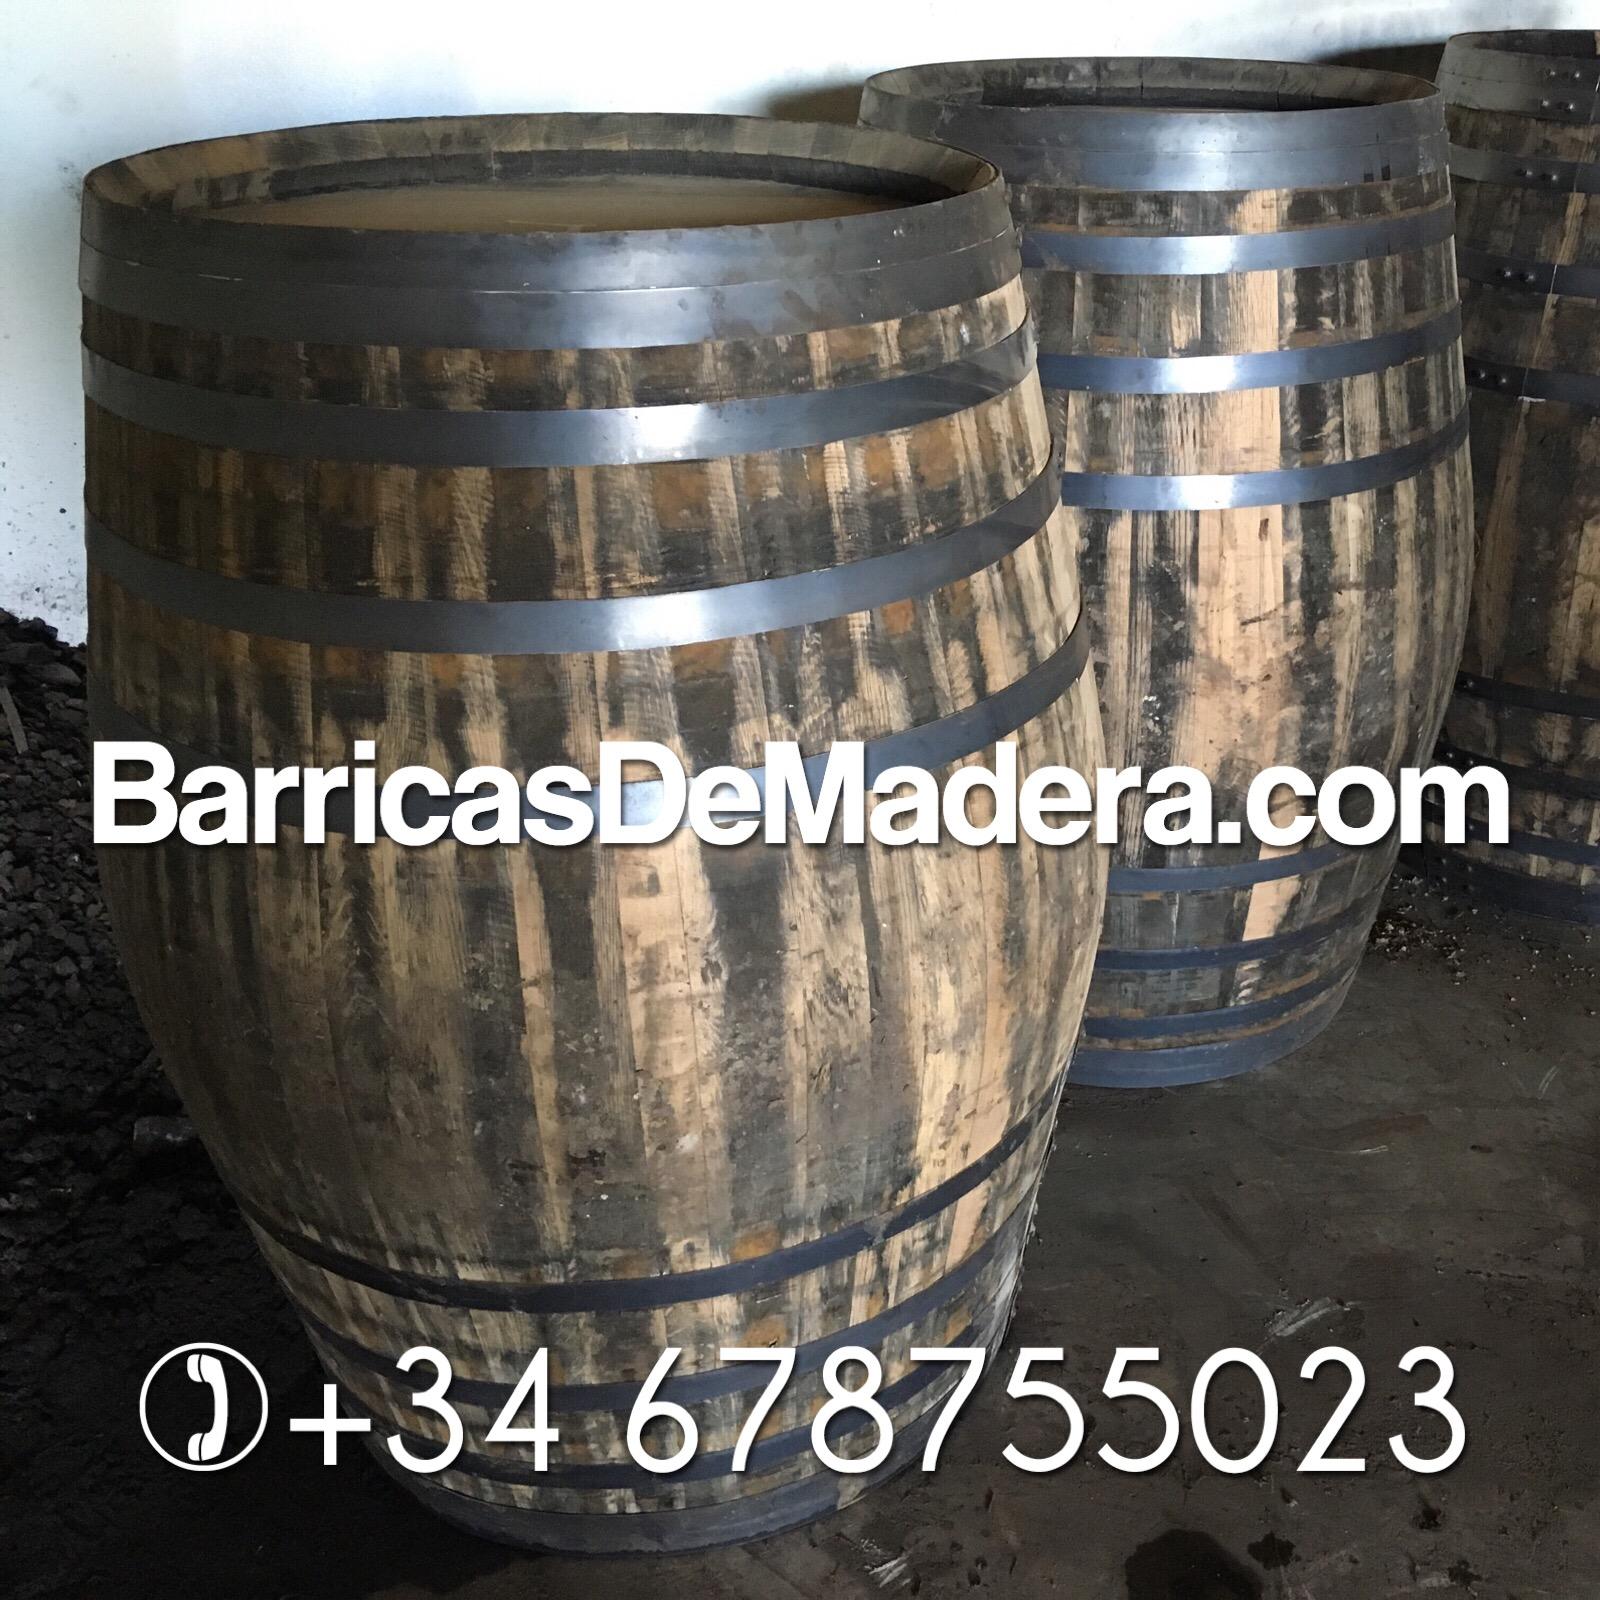 distillery-cooperage-sherry-casks-single-malt-whiskey-bourbon